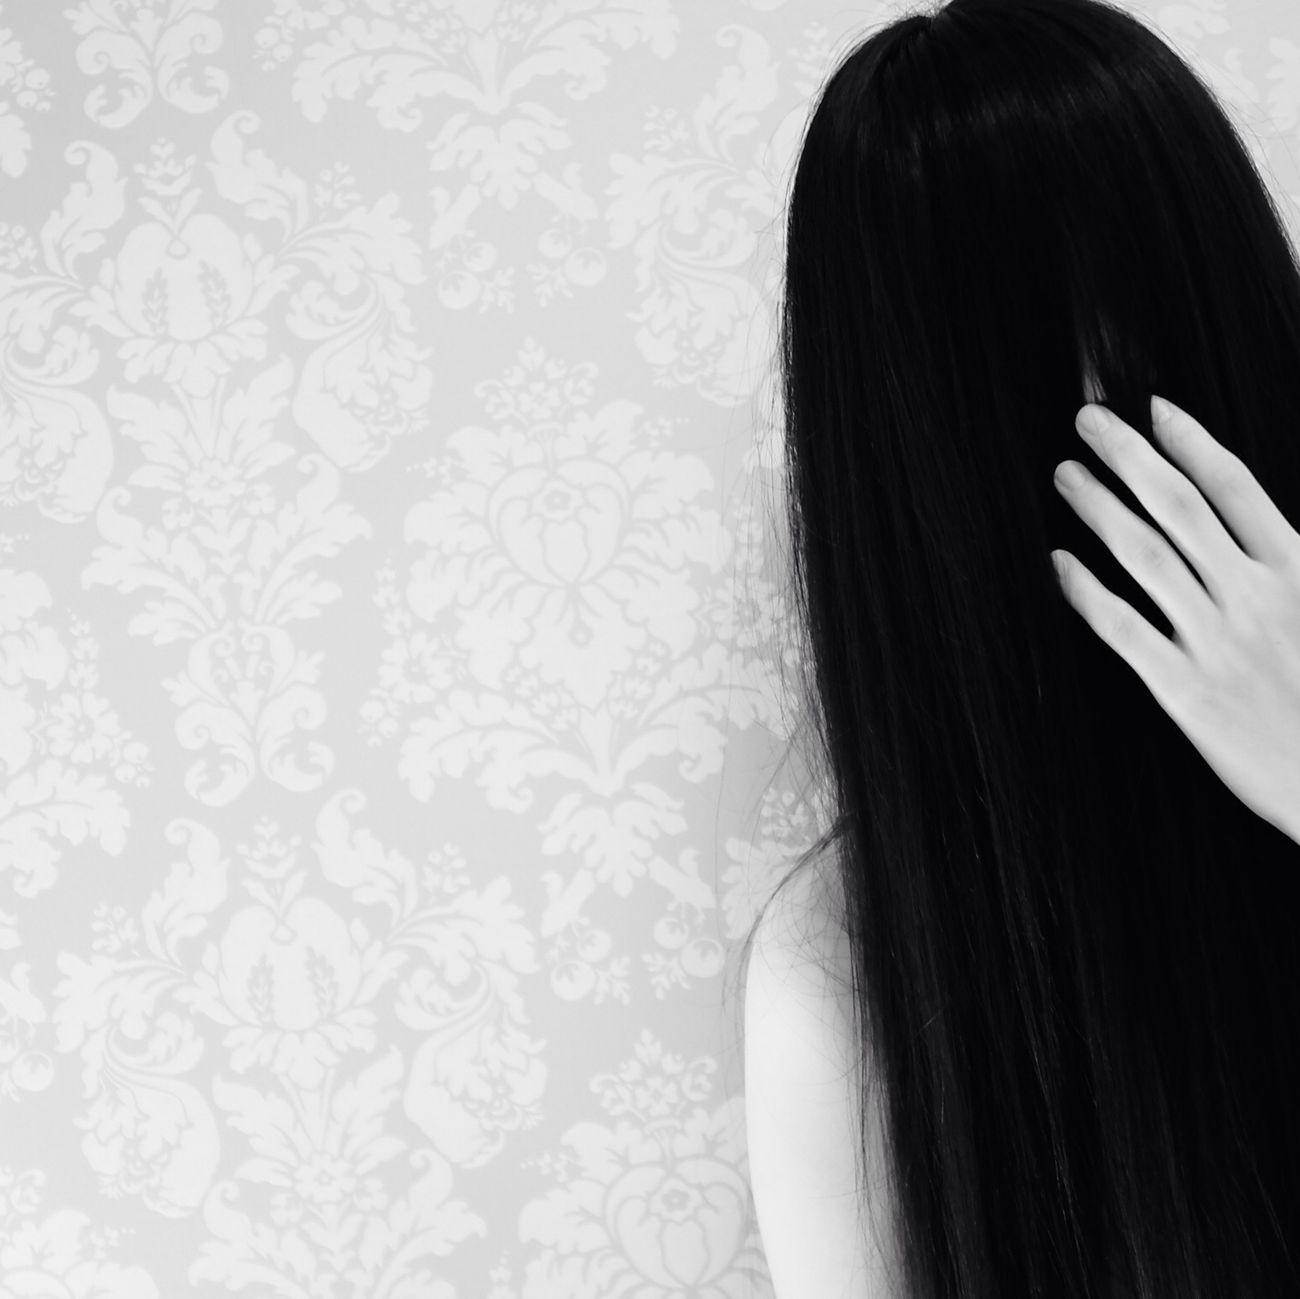 Monochrome Blackandwhite Hand Hair